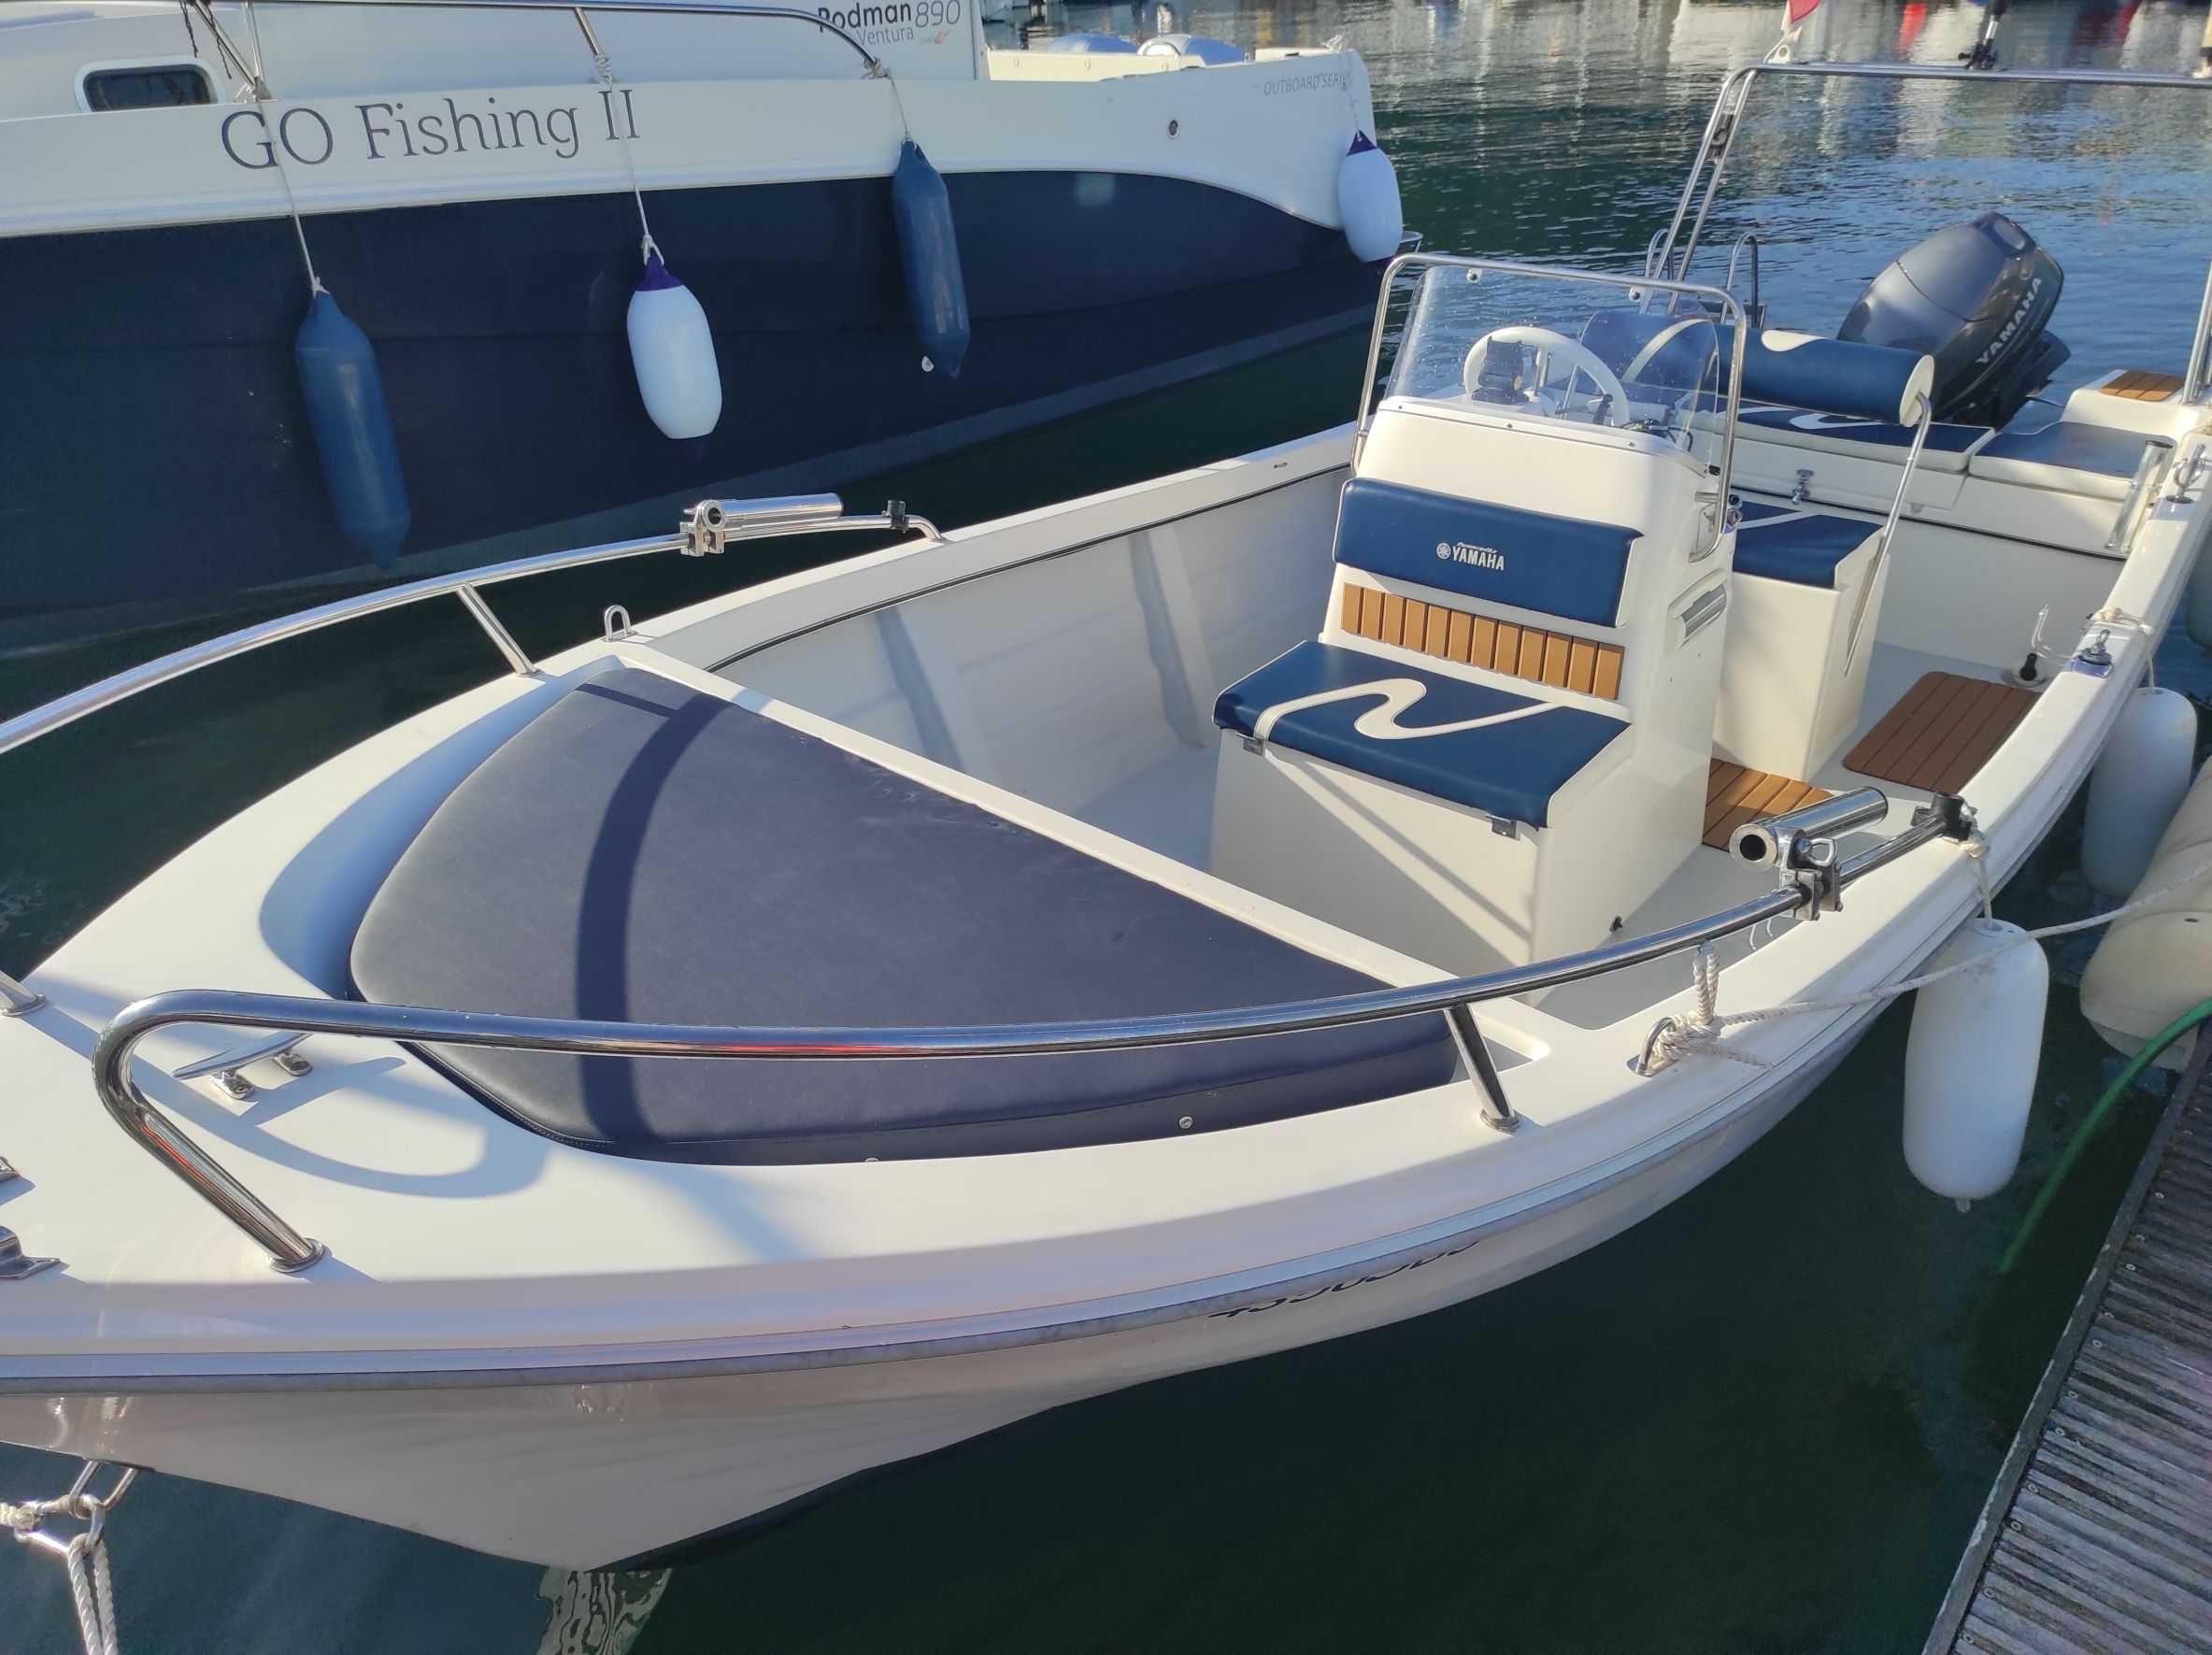 Barco Obe Fisher 550 cc